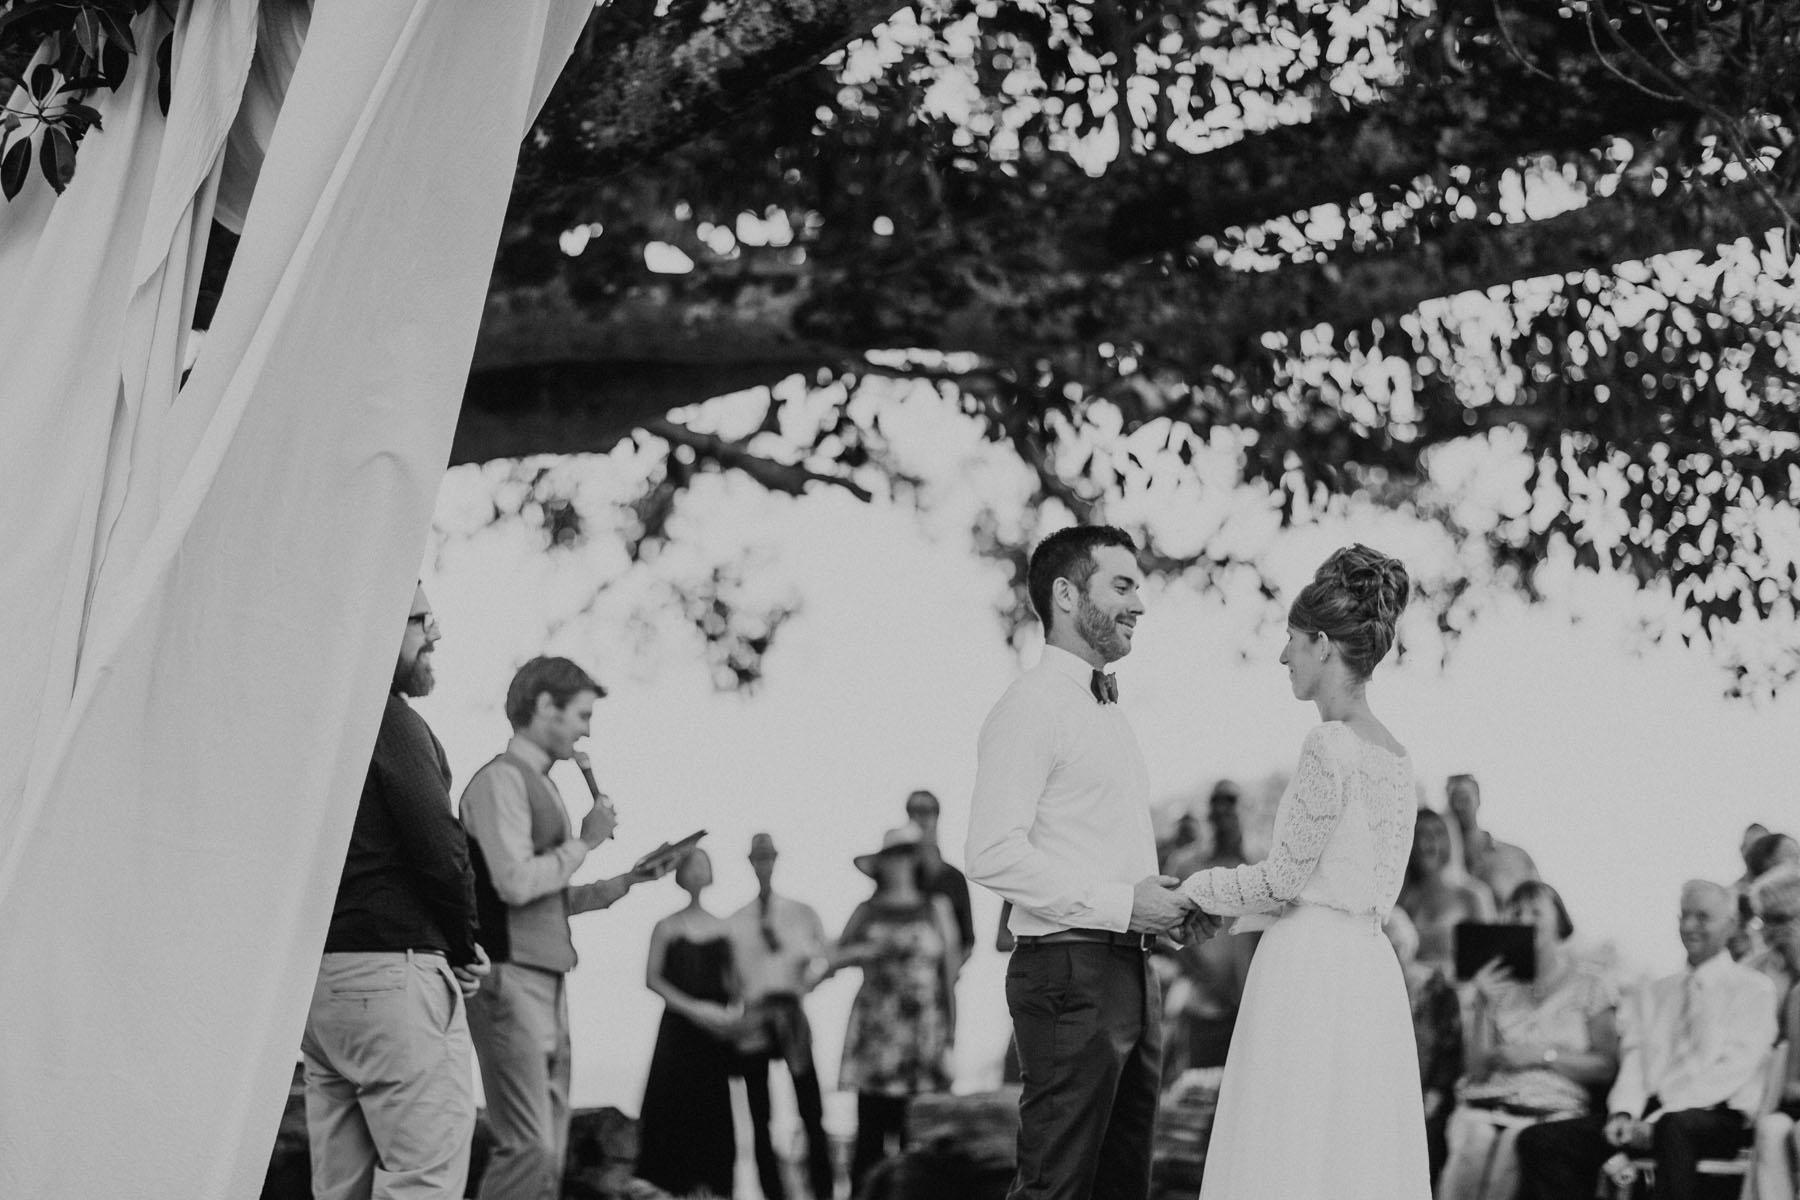 08_midginbill hill wedding .jpg